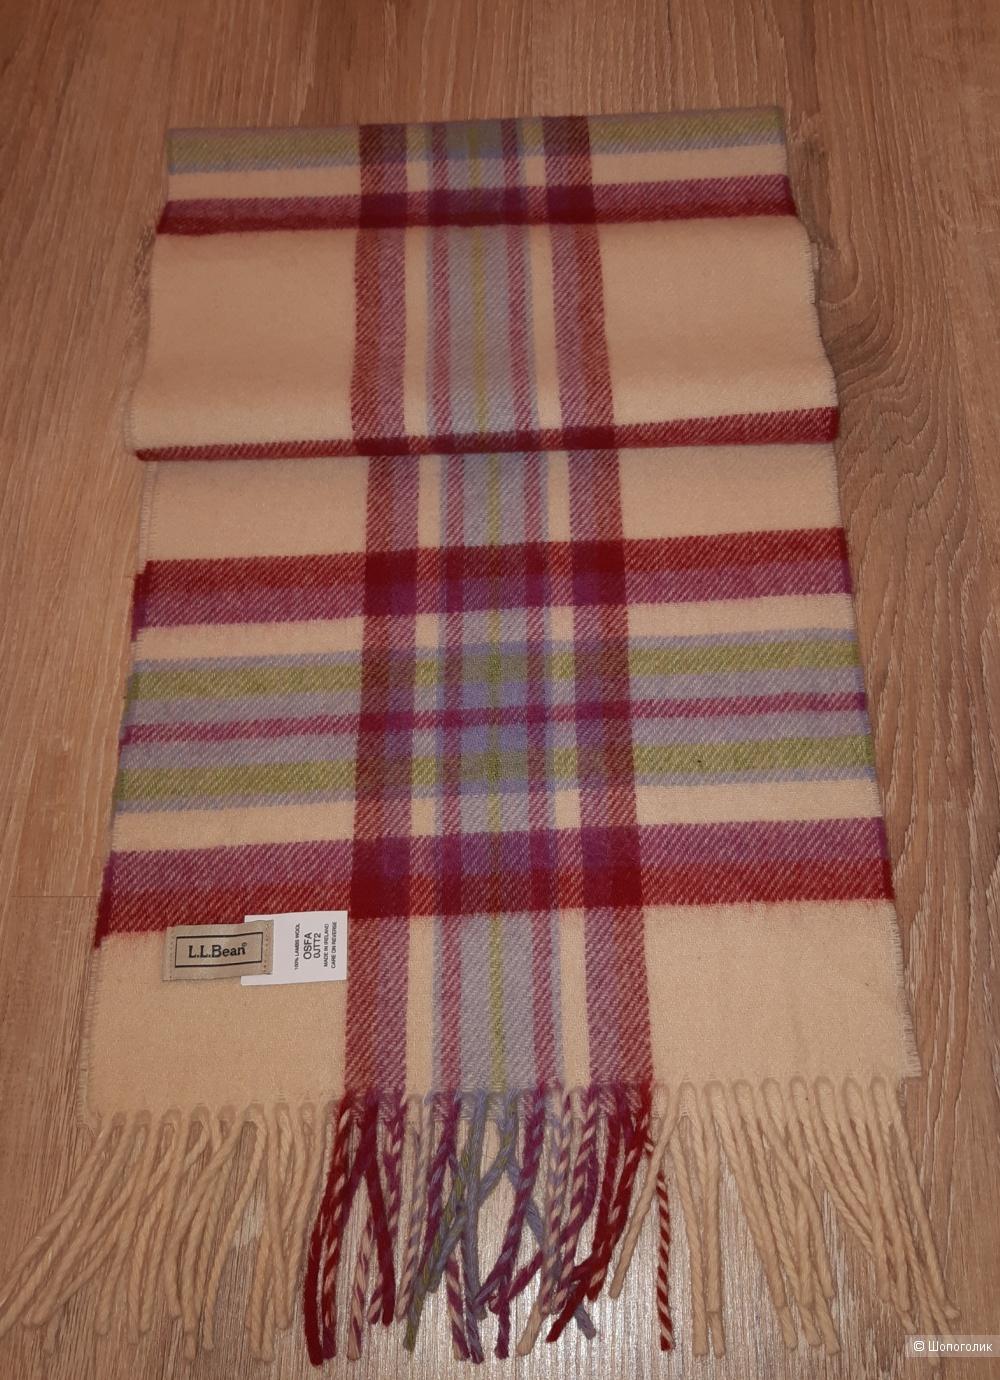 Шерстяной шарф l.l.bean, размер 29*155